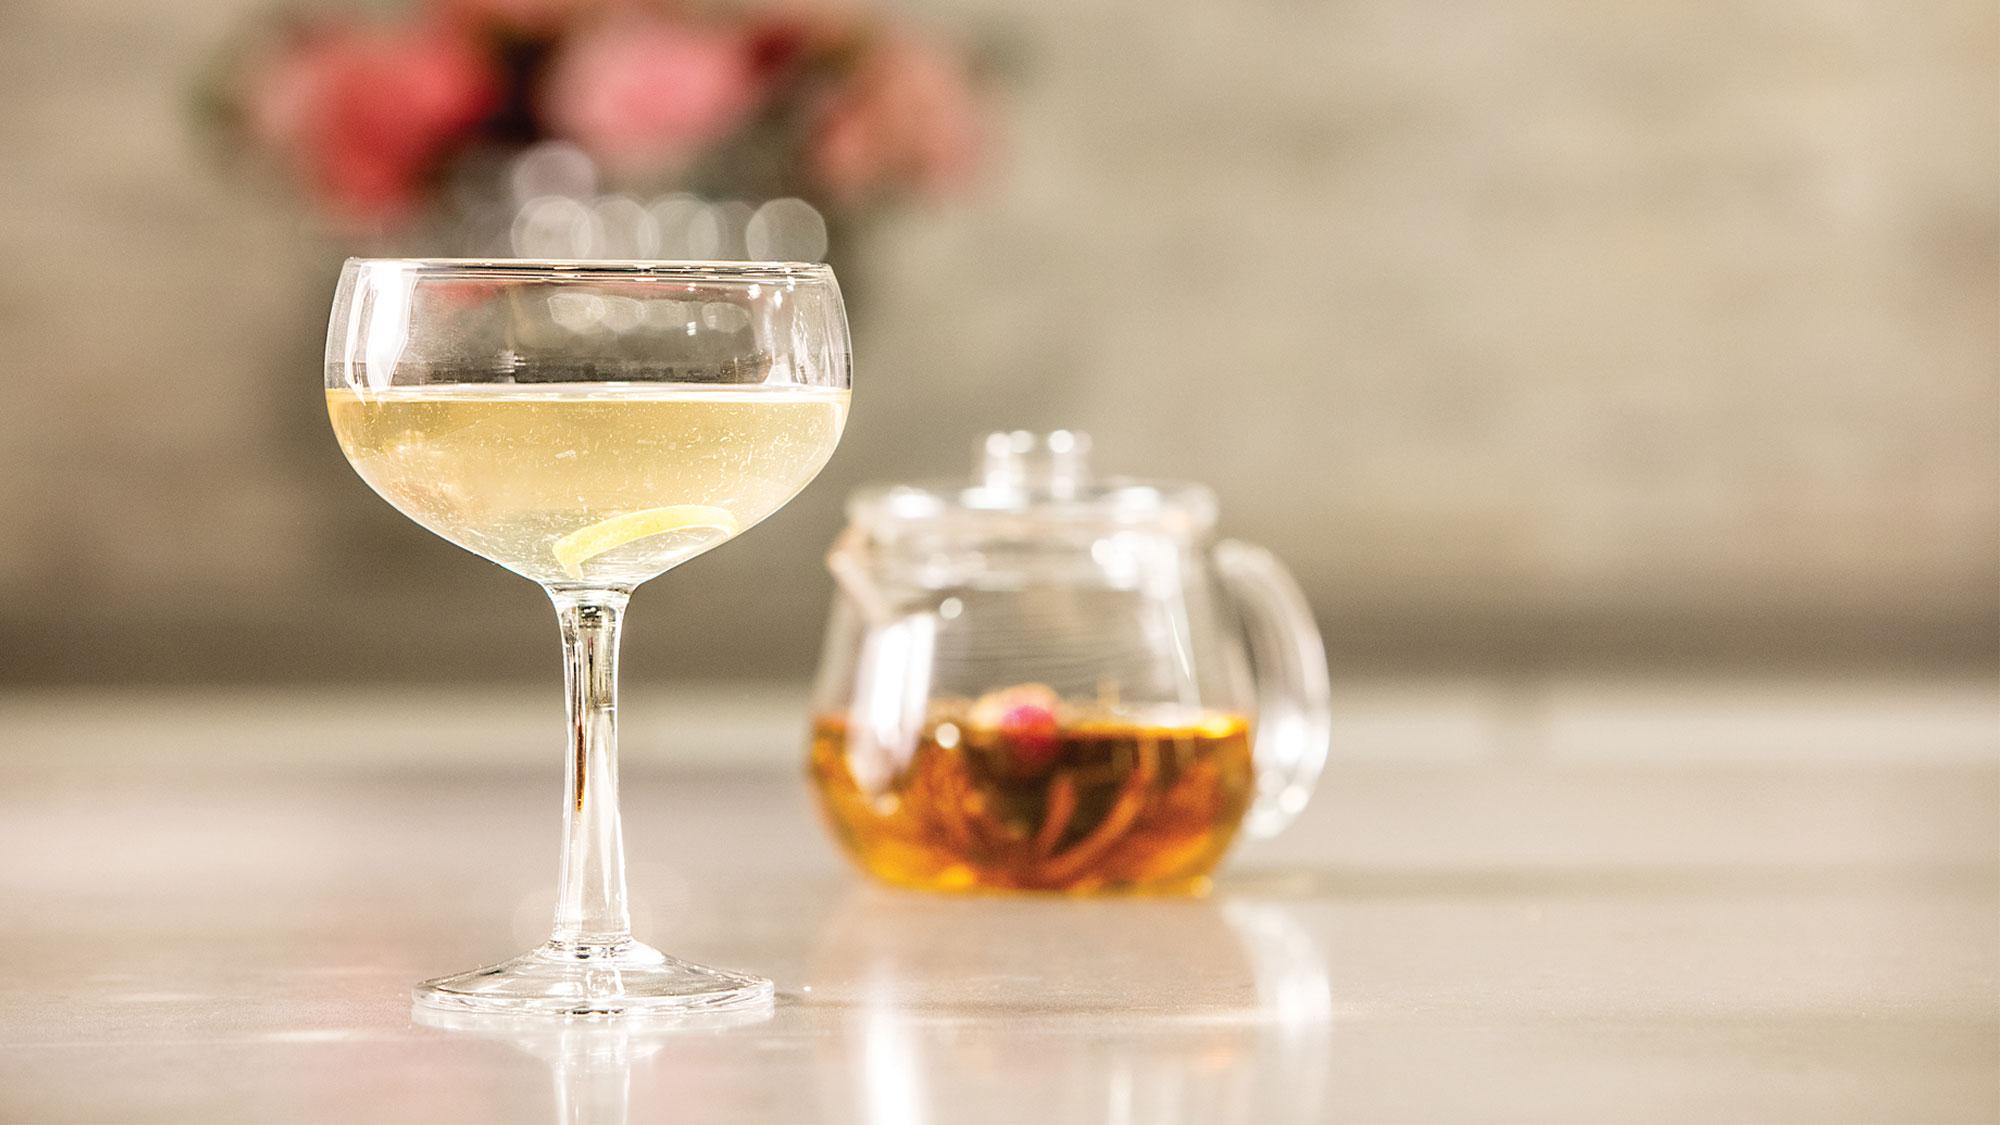 Spillin' the Tea Cocktail Recipe